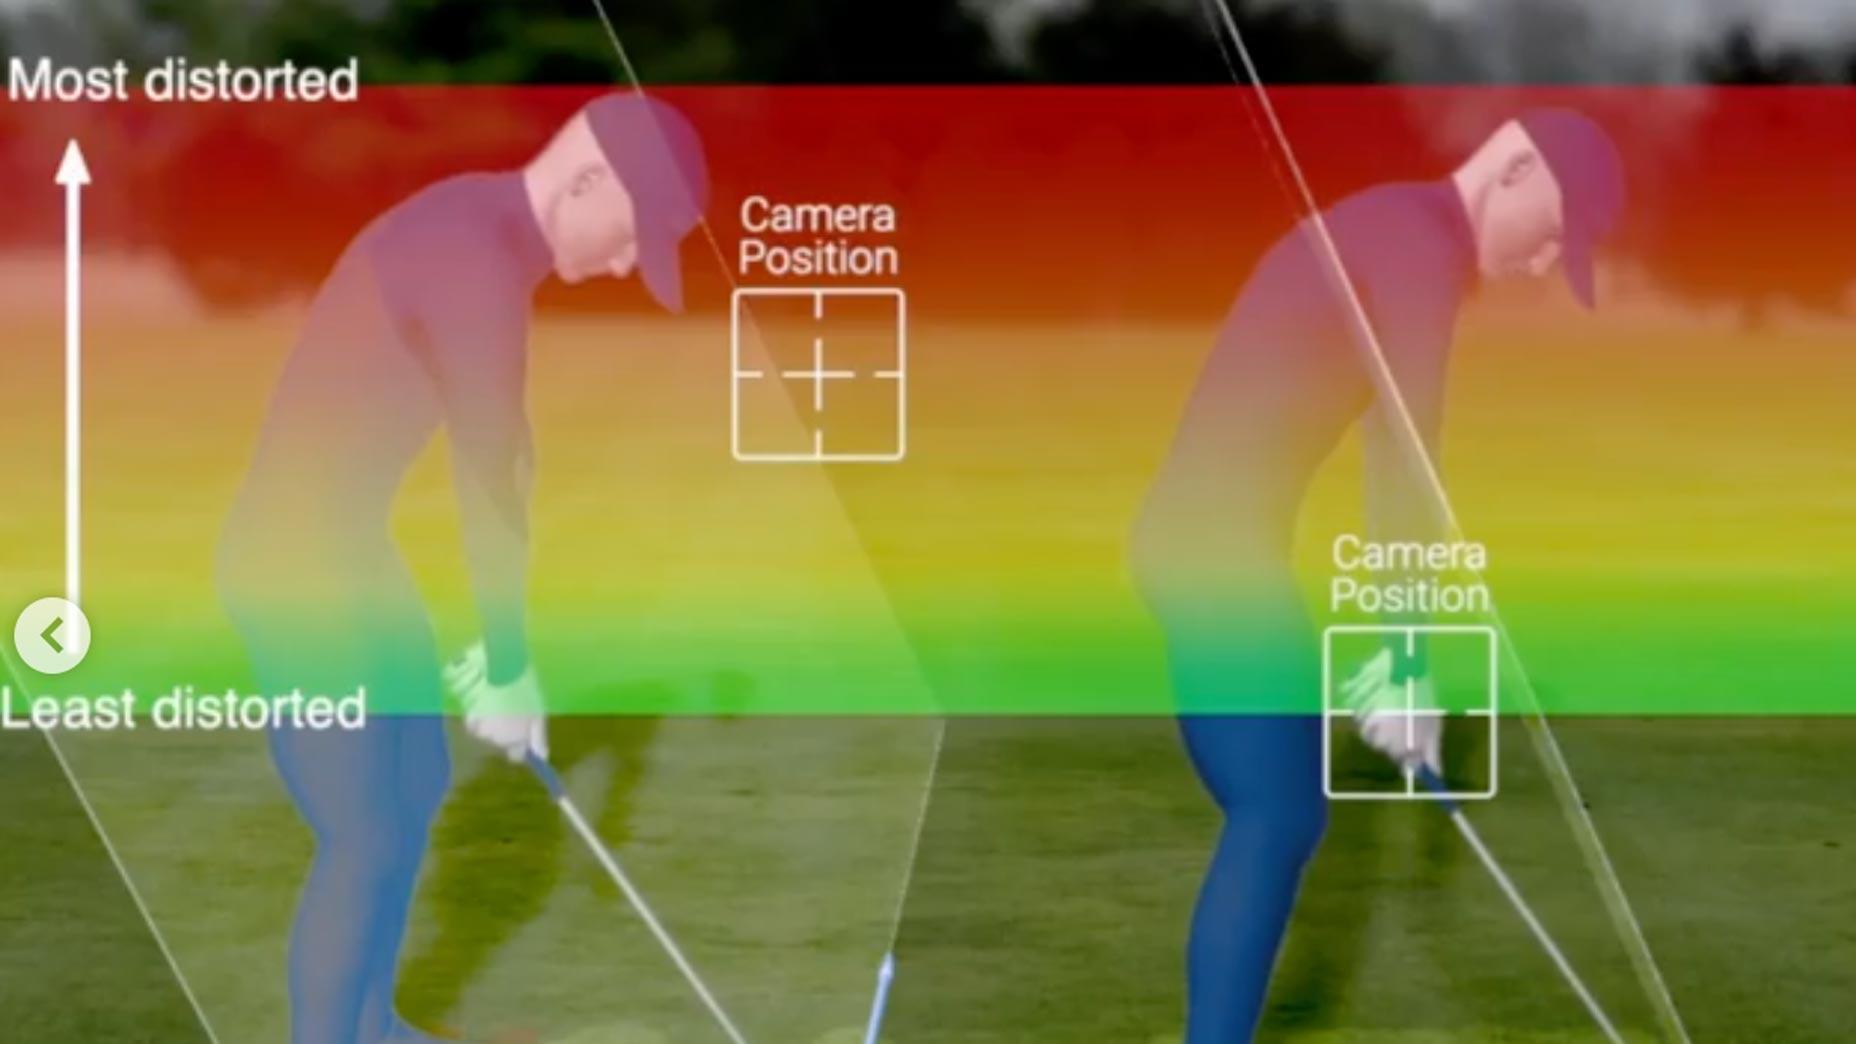 correct camera position example